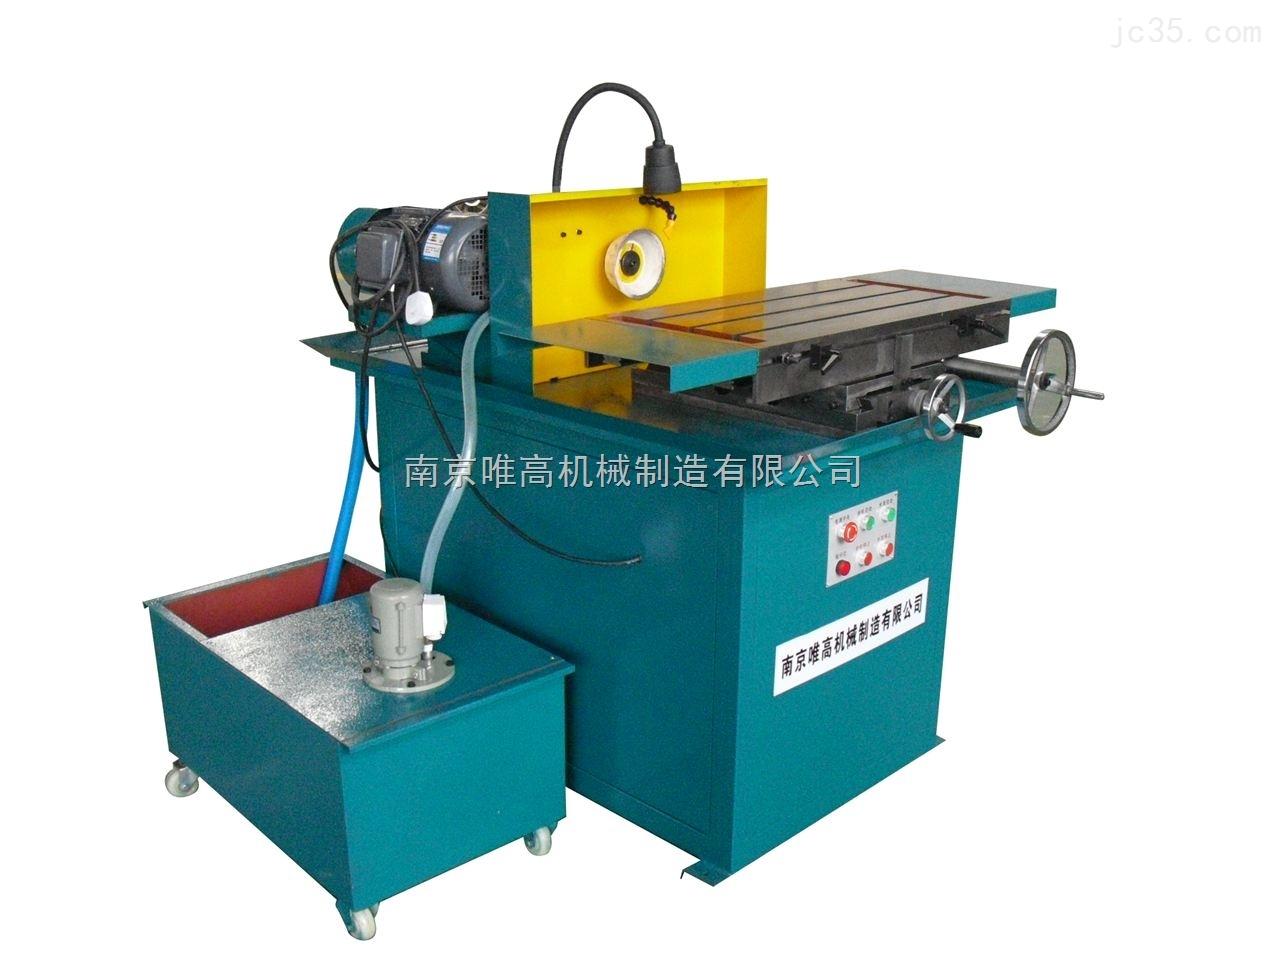 WE-350长刀端面磨刀机